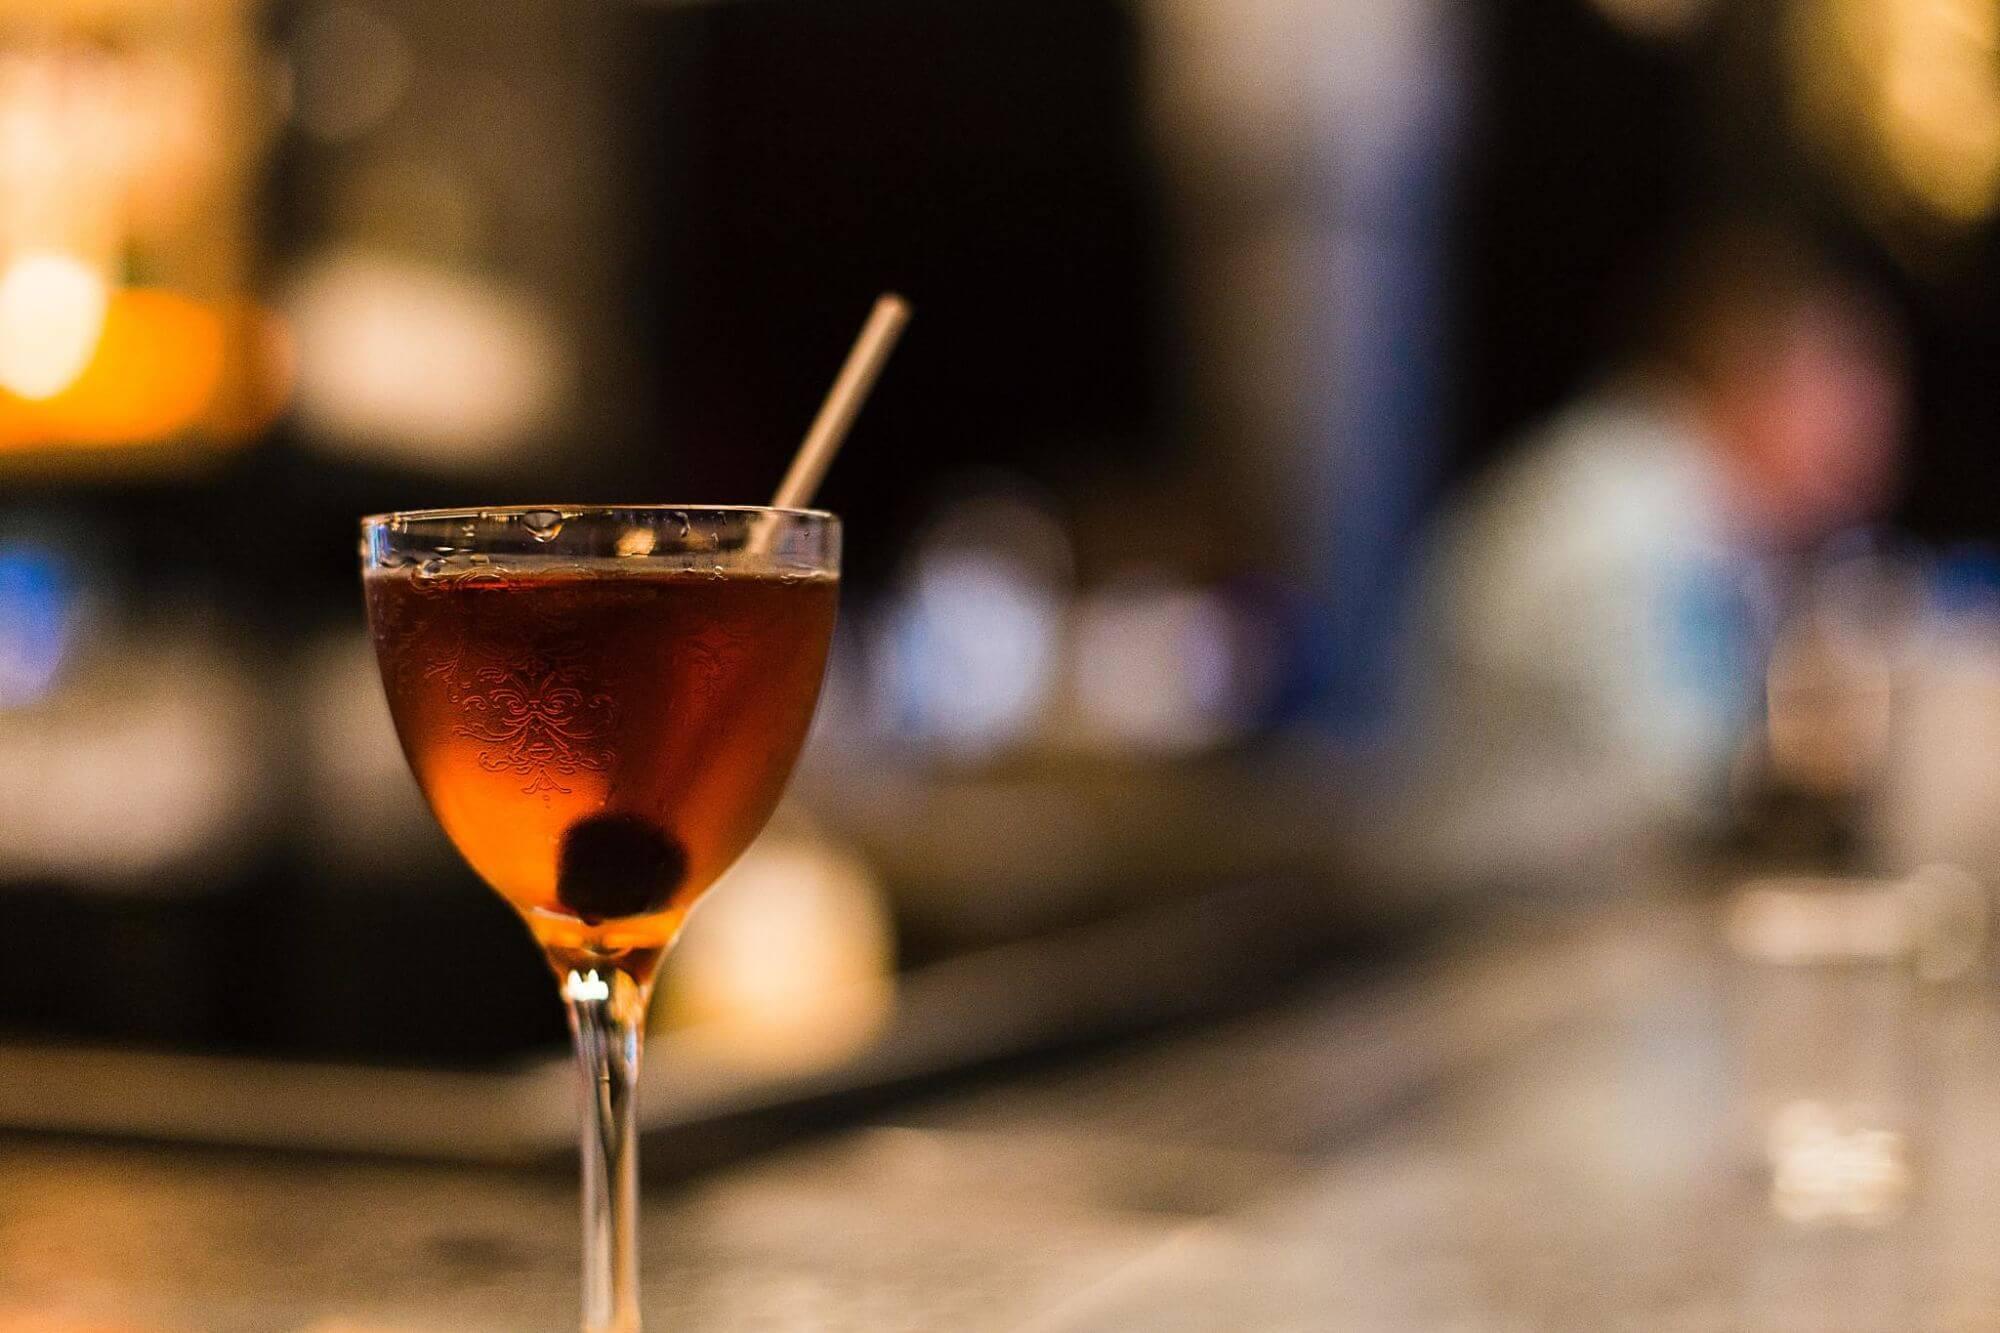 Trip Around the world in 5 cocktails--Manhattan from the U.S.